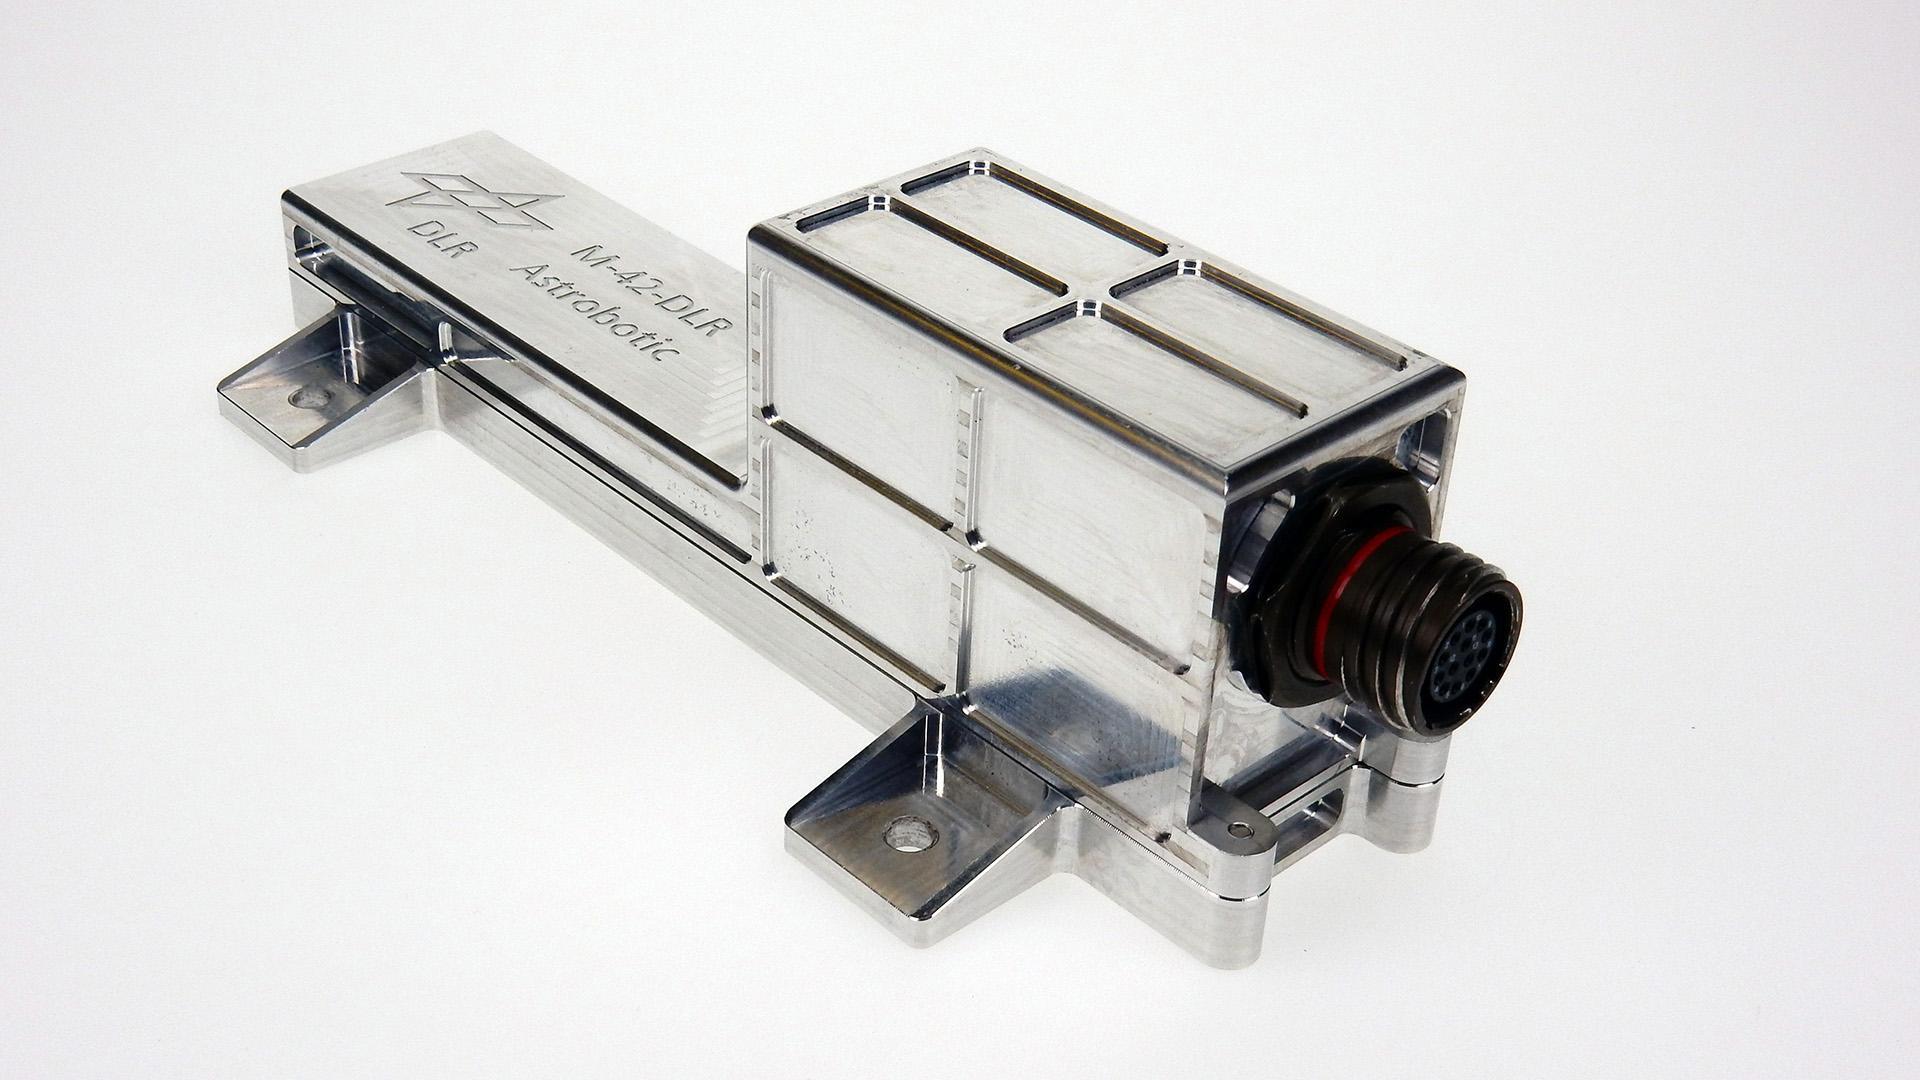 M-42 Strahlungsdetektor